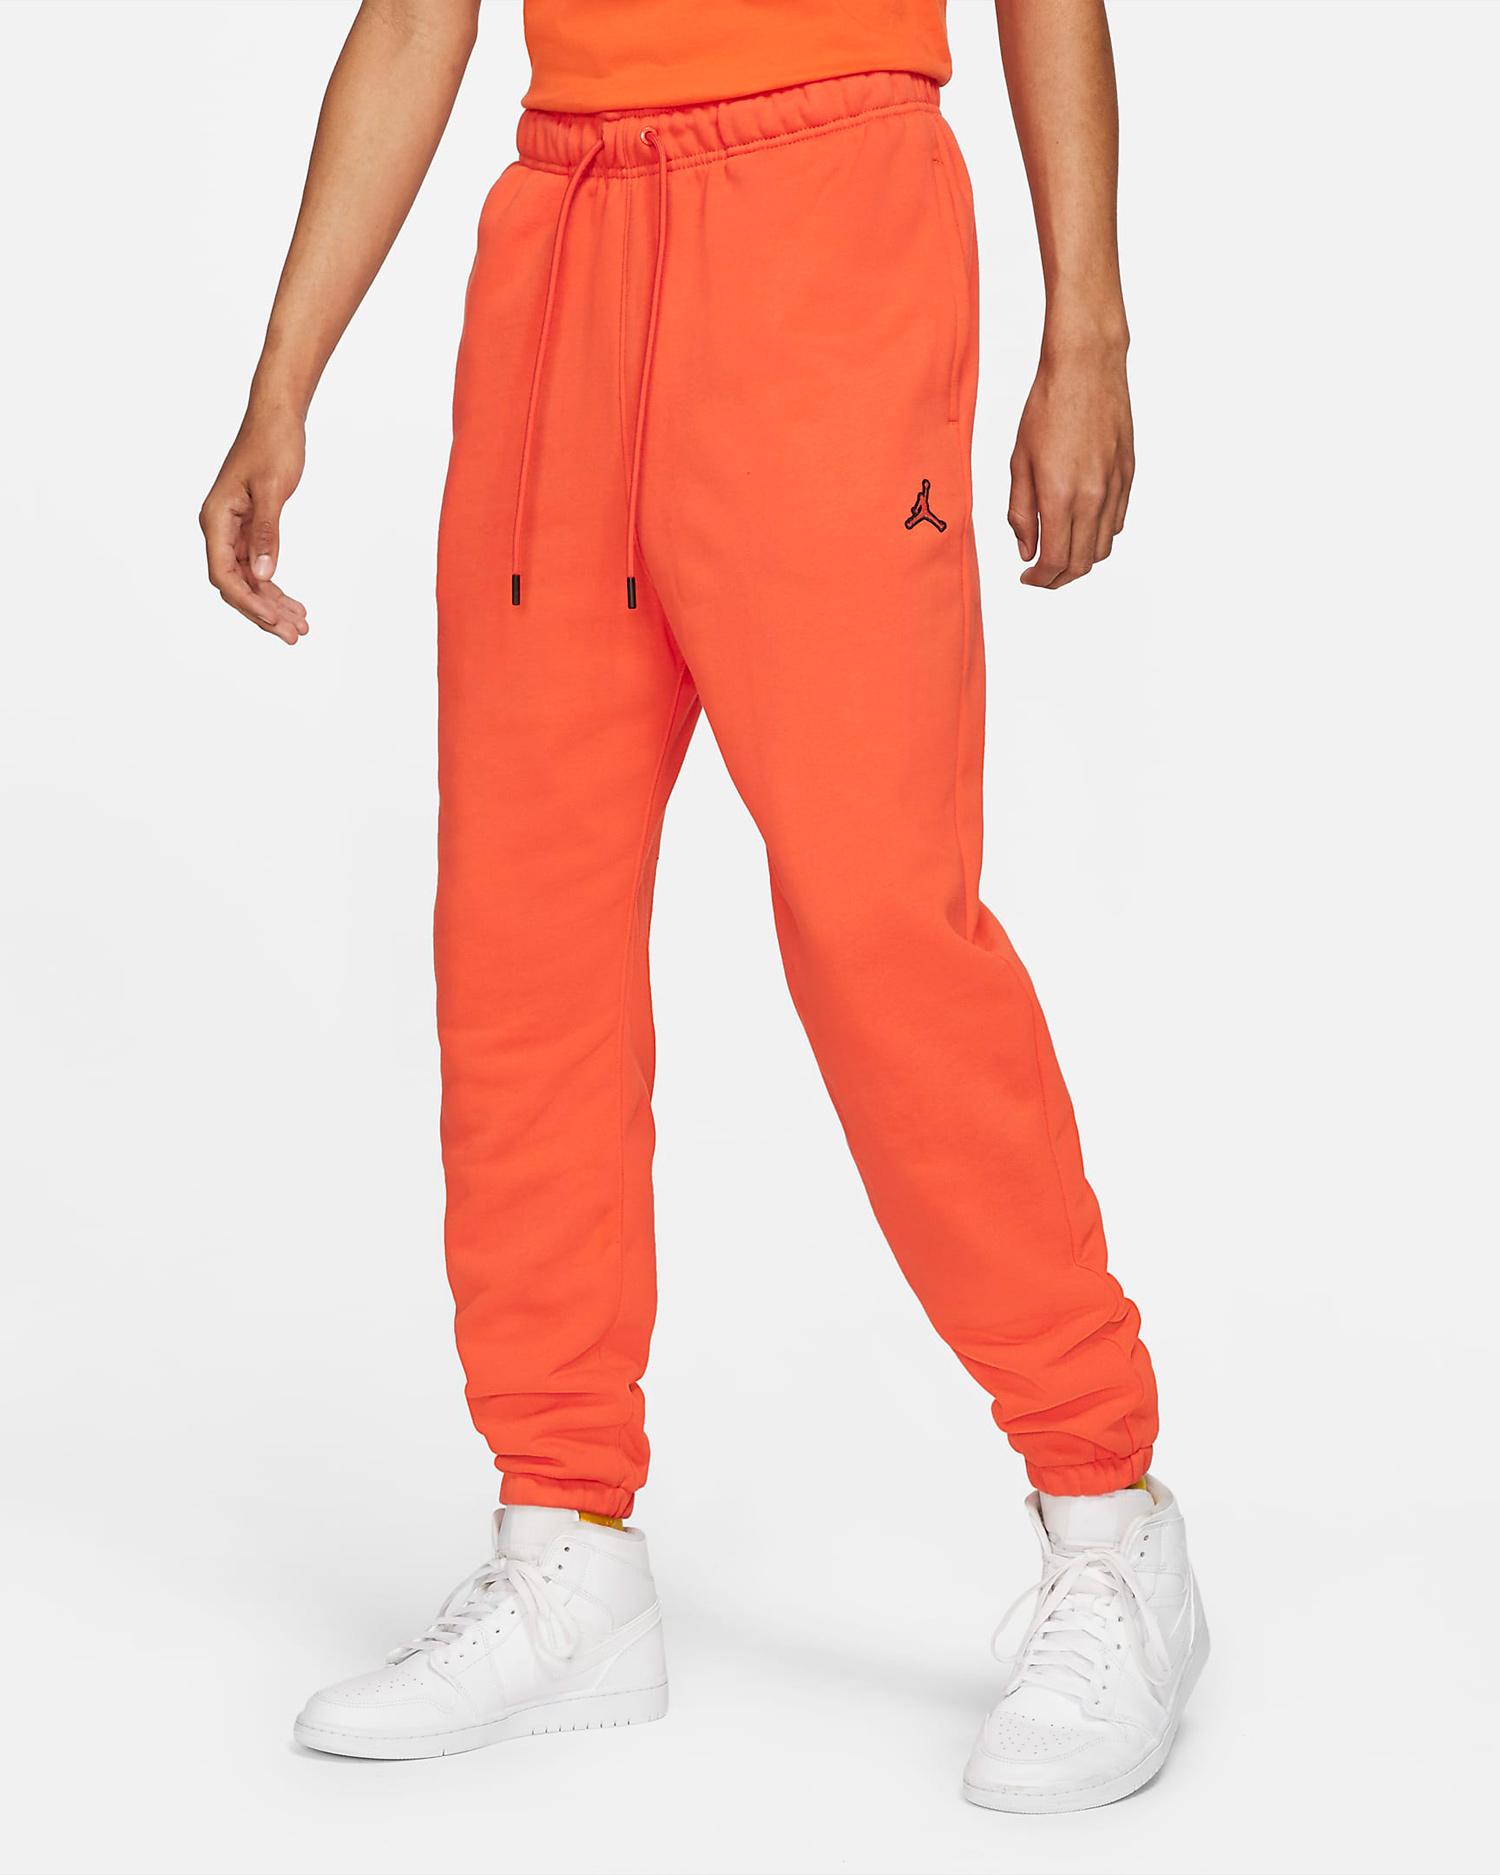 jordan-electro-orange-fleece-pants-1